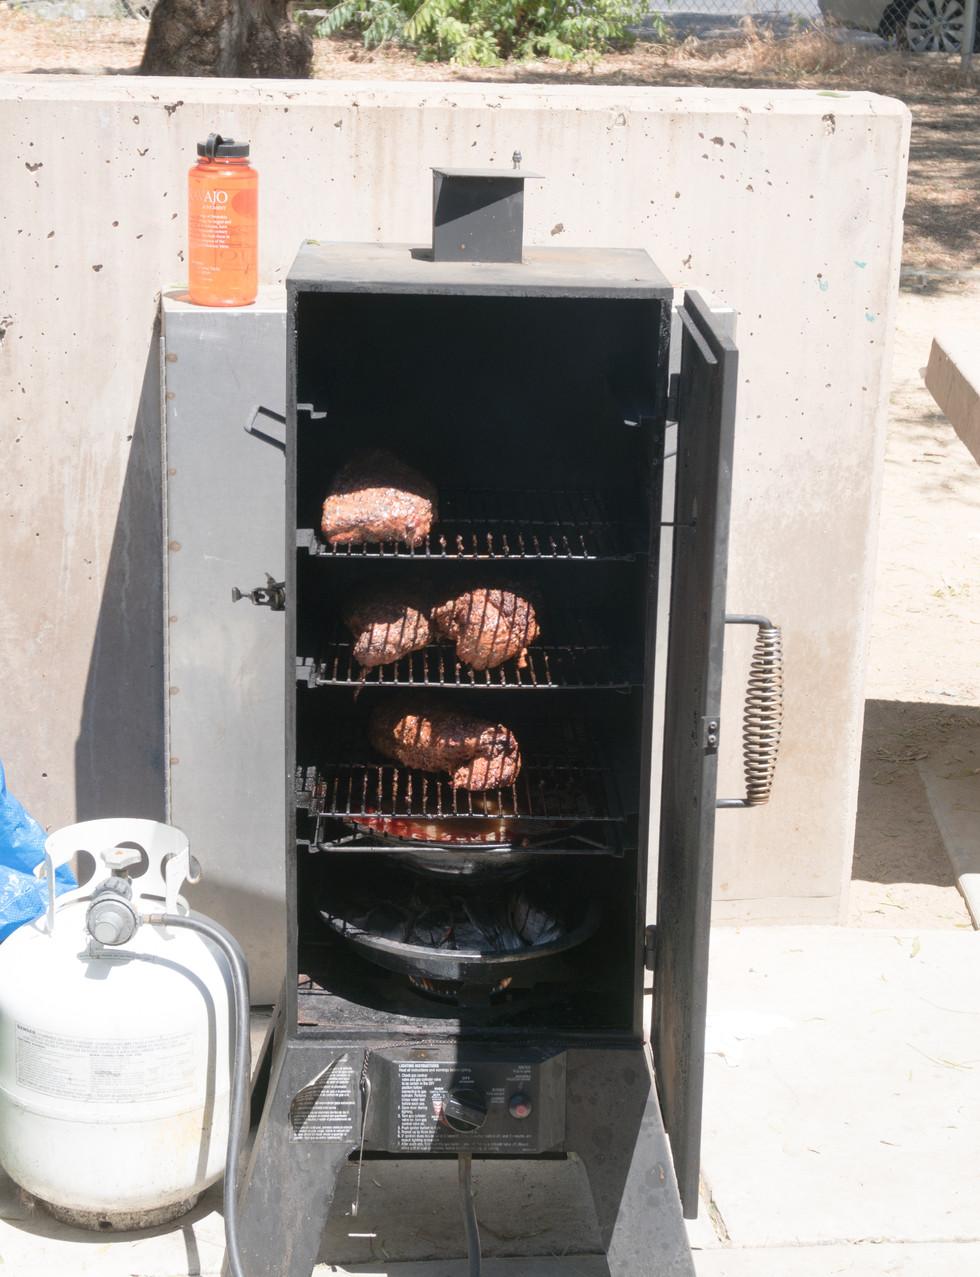 Smokin' Bob's BBQ!